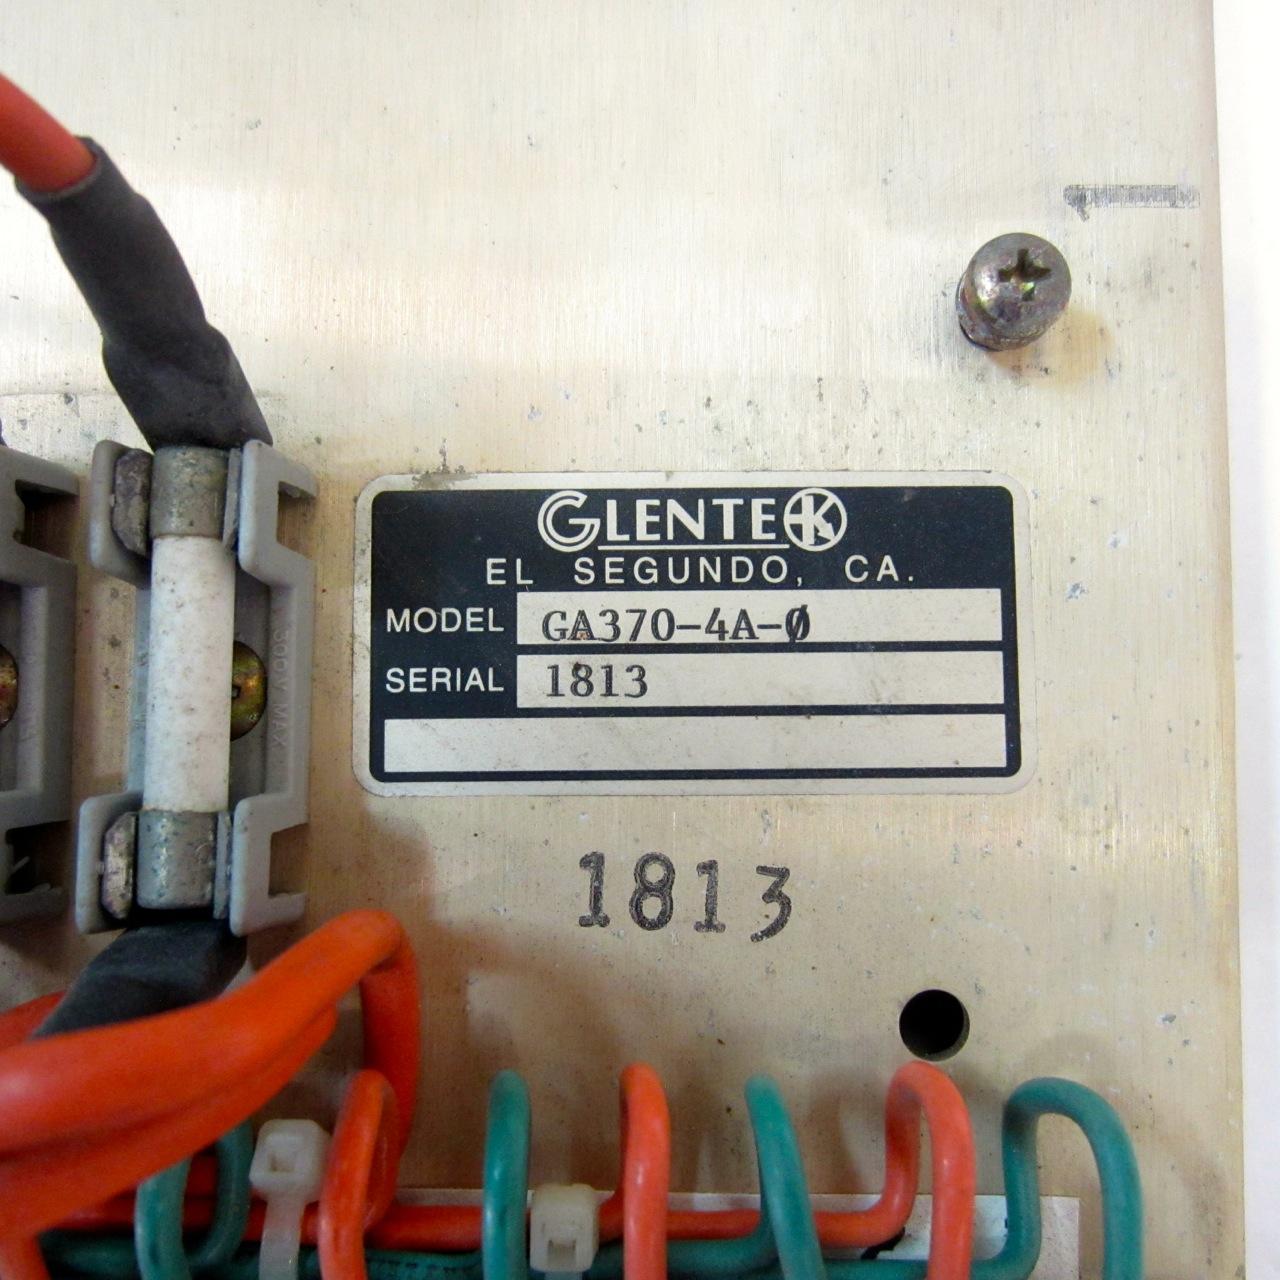 Glentek-GA370-4A-0